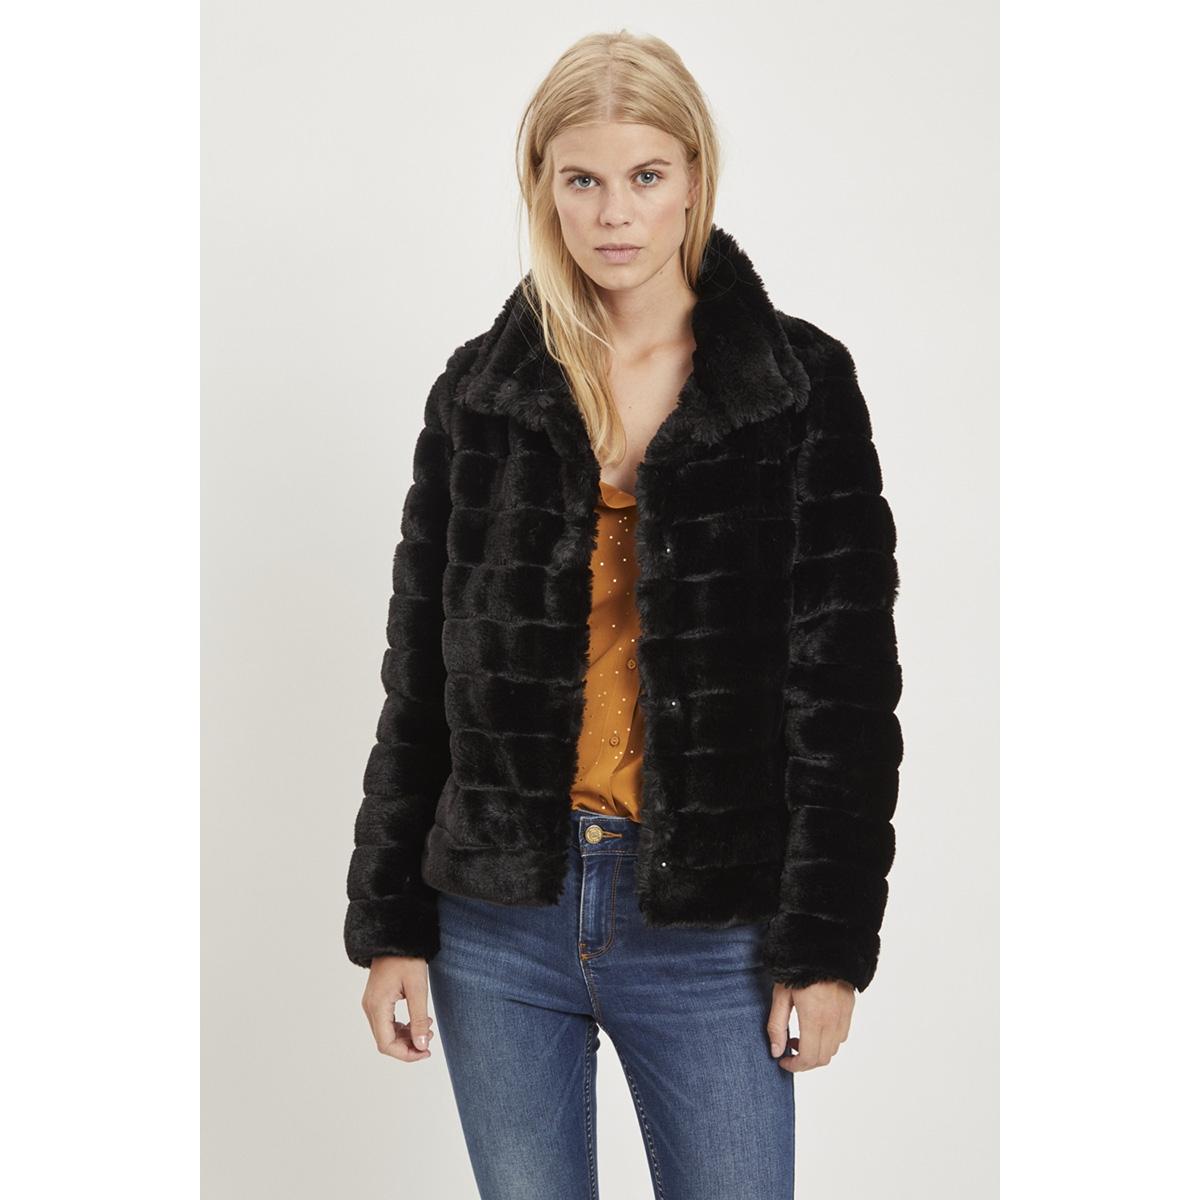 vifarry short jacket-noos 14049848 vila jas black